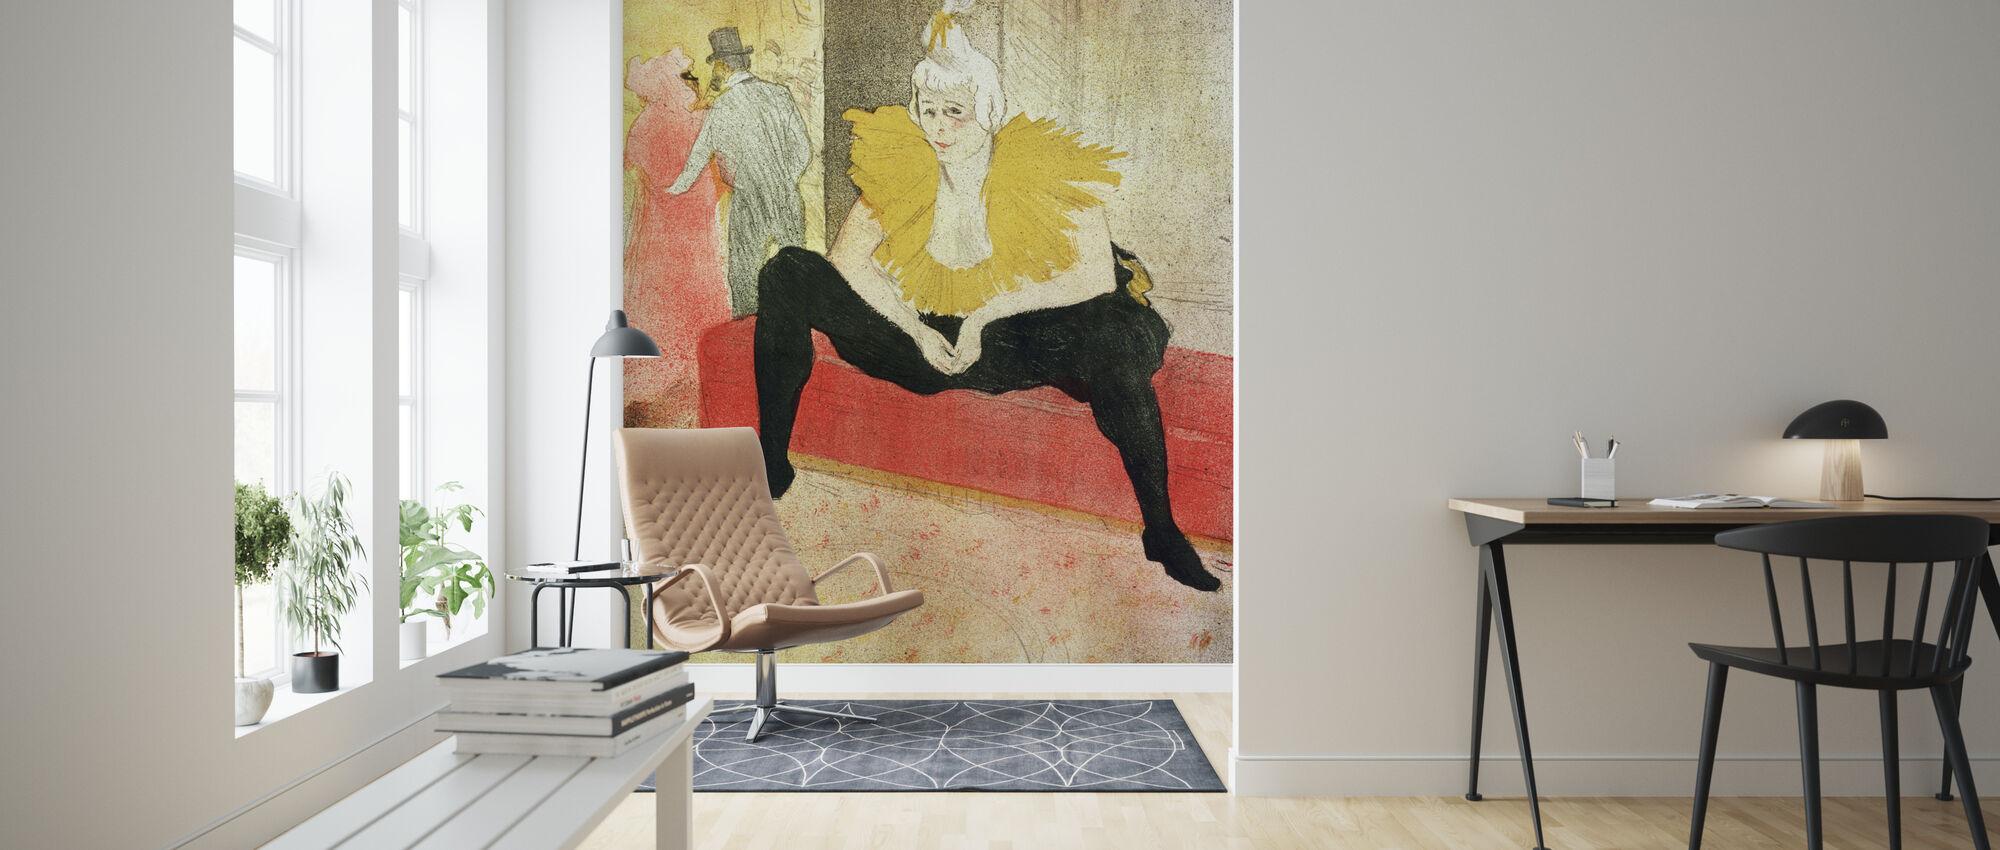 Clowness Looks Around, Henri Toulouse Lautrec - Wallpaper - Living Room